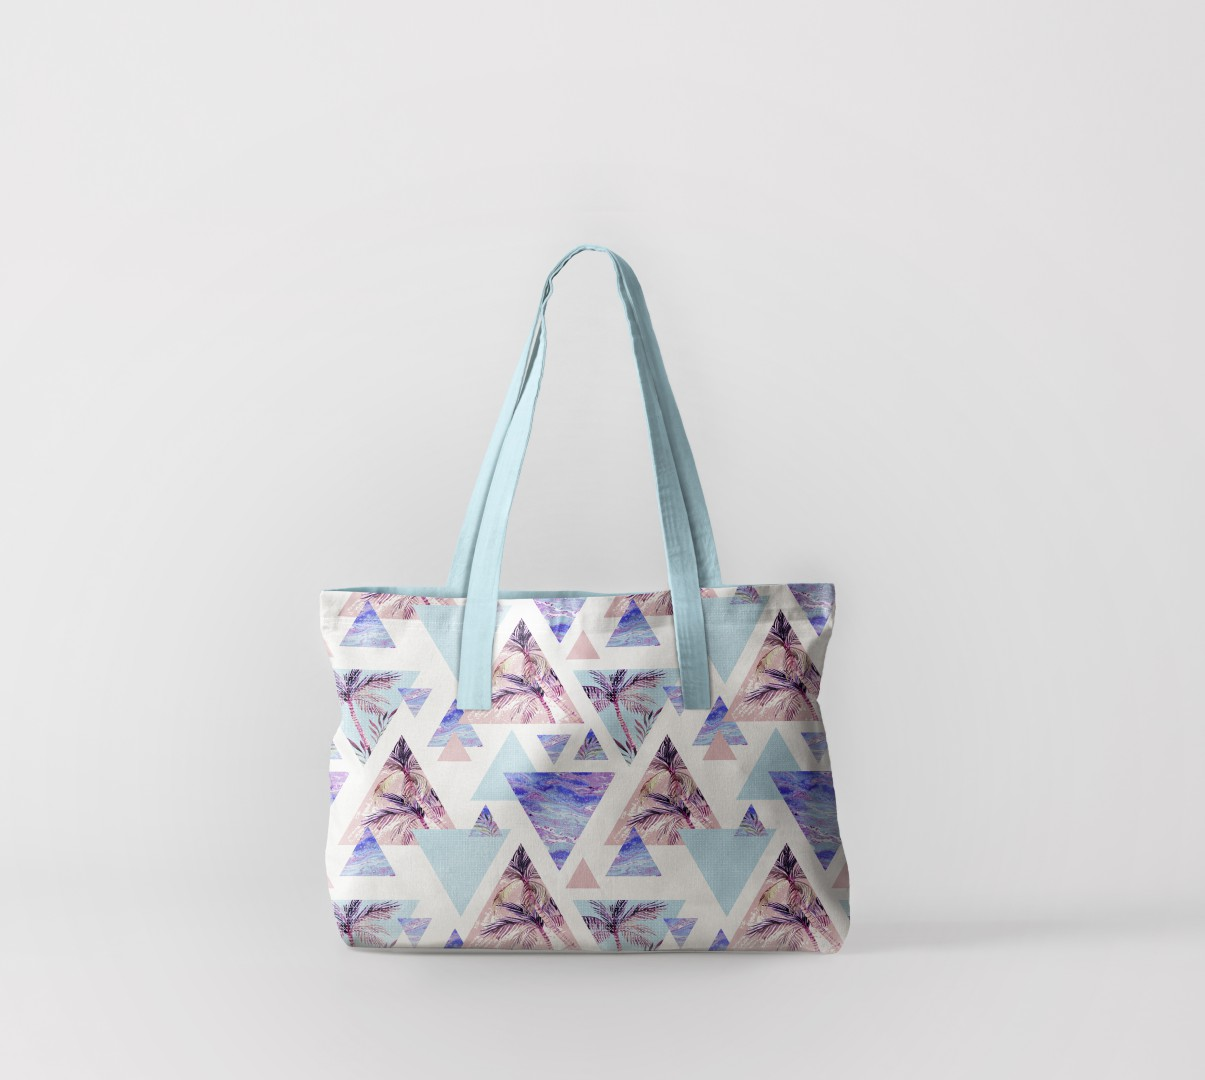 Пляжная сумка Пальма в абстракции (50х40 см) Олимп Текстиль oli732585